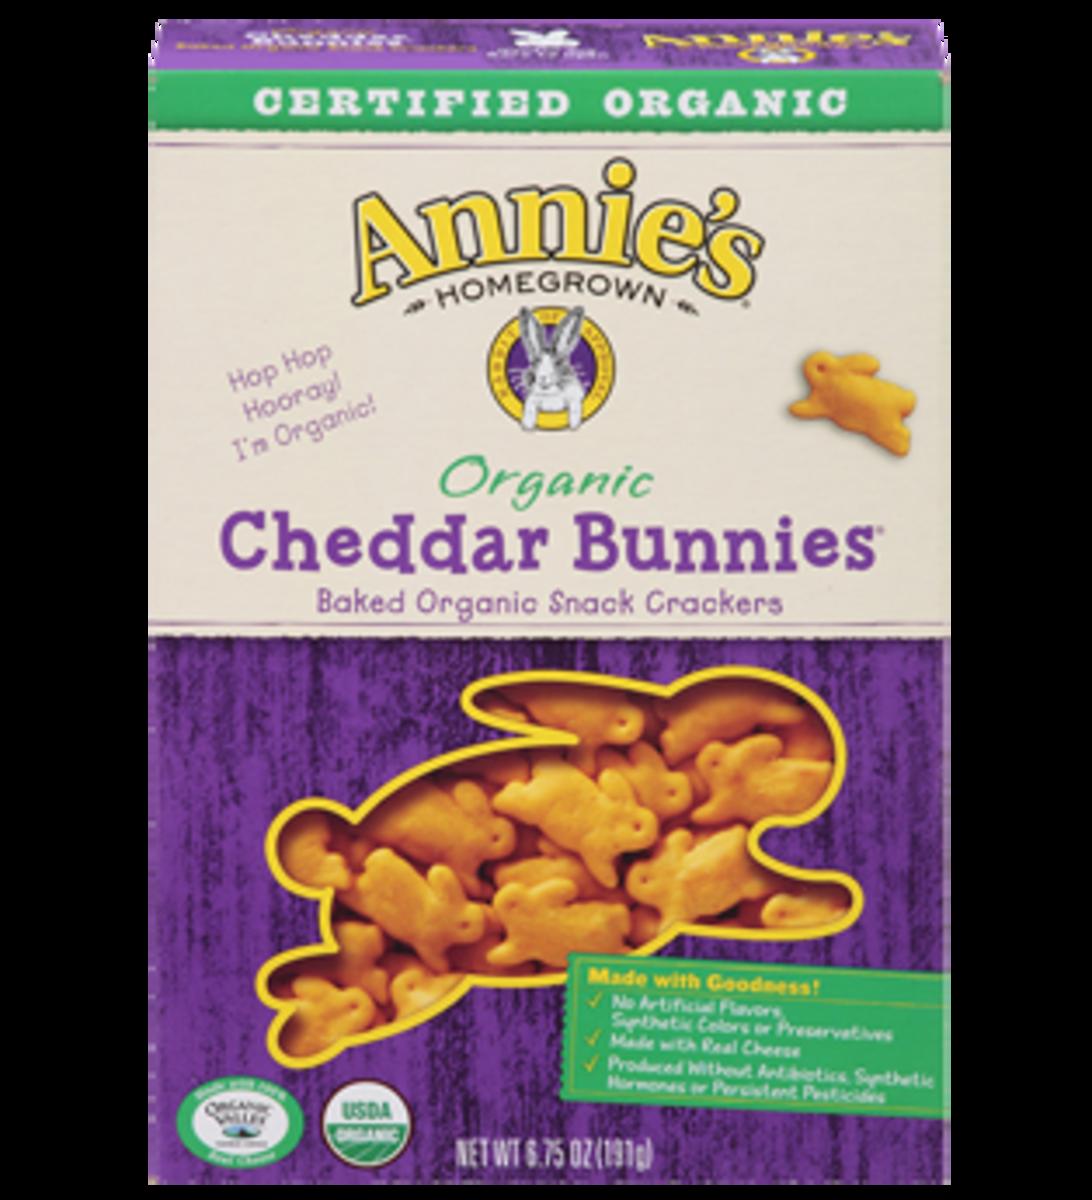 org_cheddar_bunnies_regularsize-1